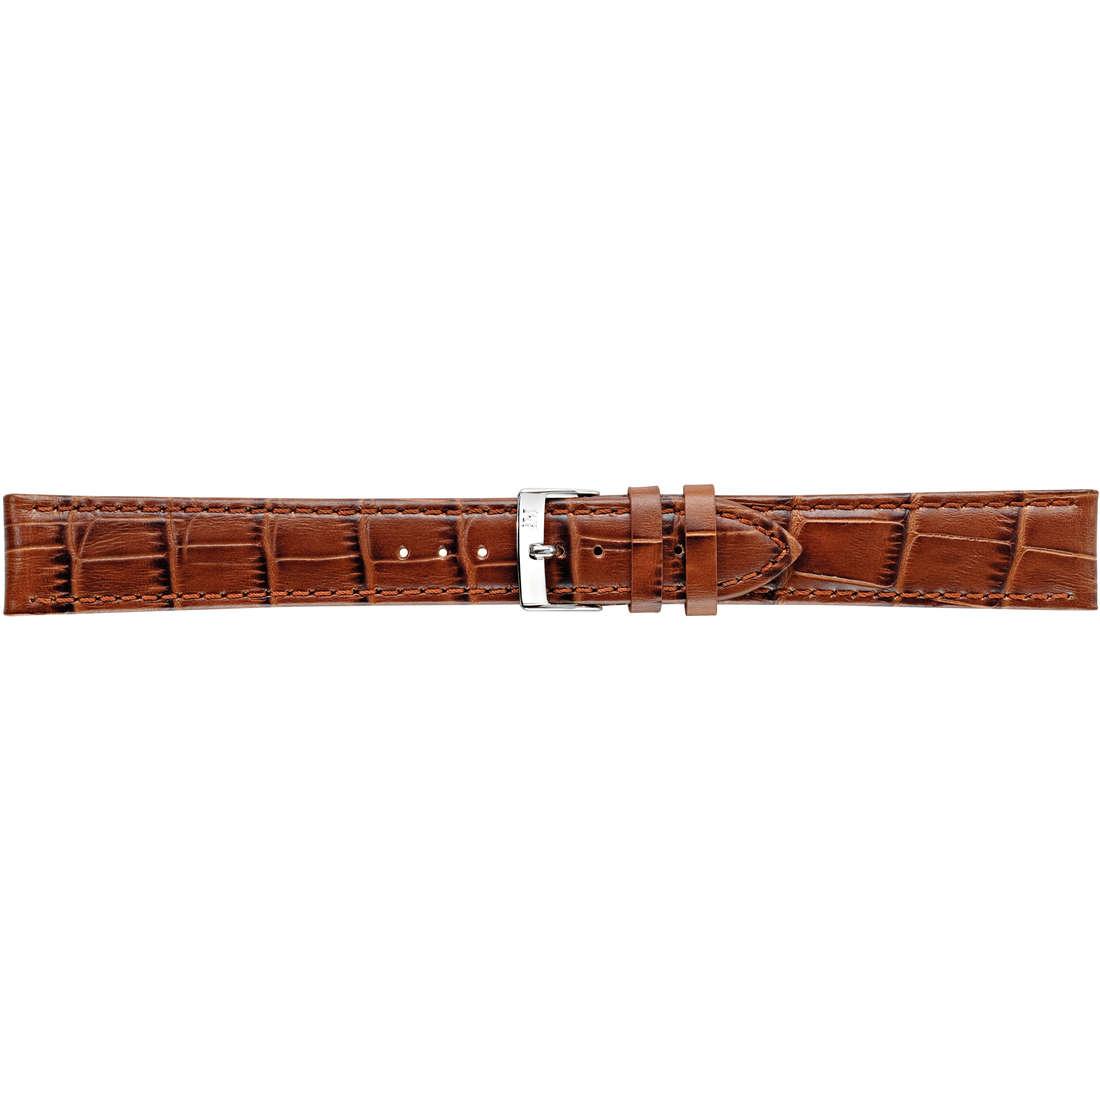 montre bande de montres unisex Morellato I Lunghi A01Y2269480041CR22